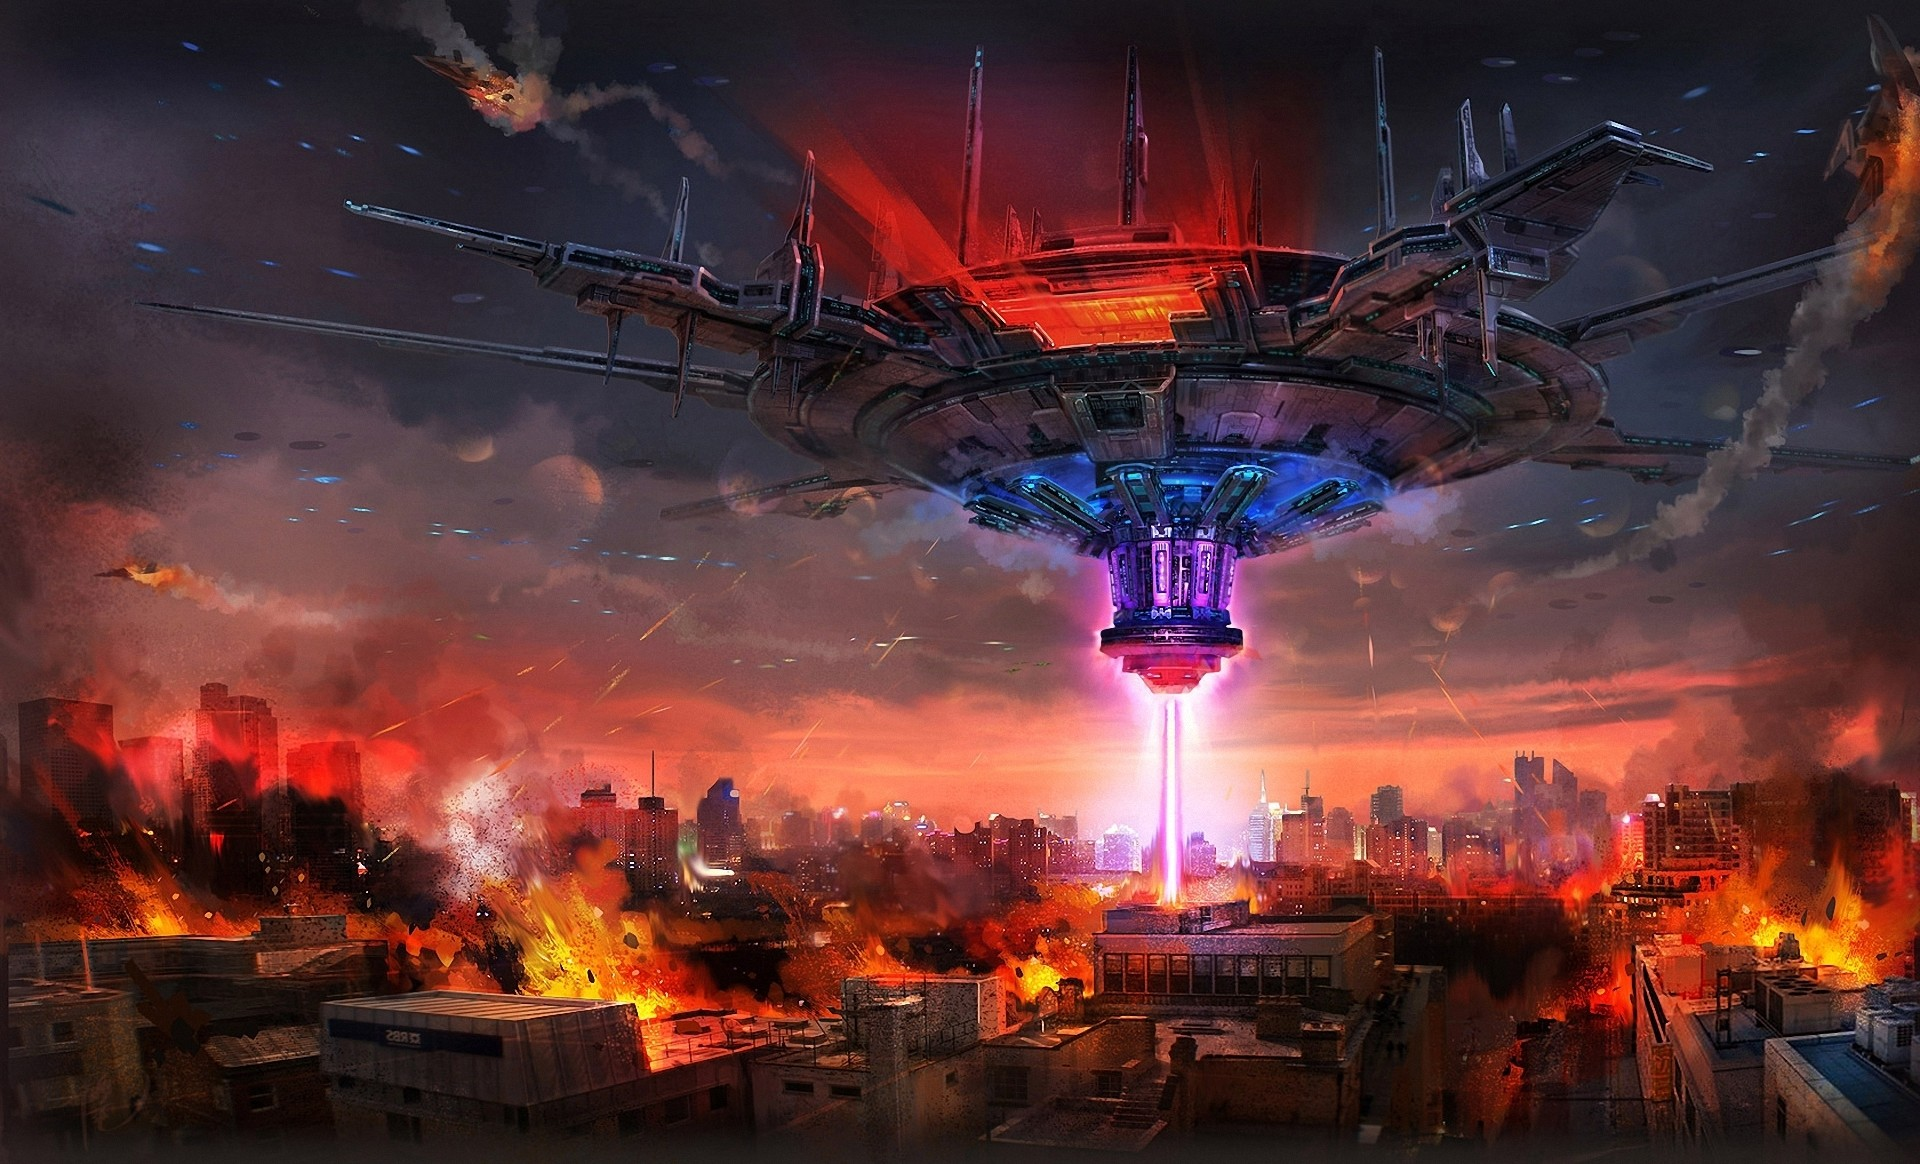 Art Mourad city ship beam destruction fire building spaceship apocalyptic  wallpaper     166466   WallpaperUP